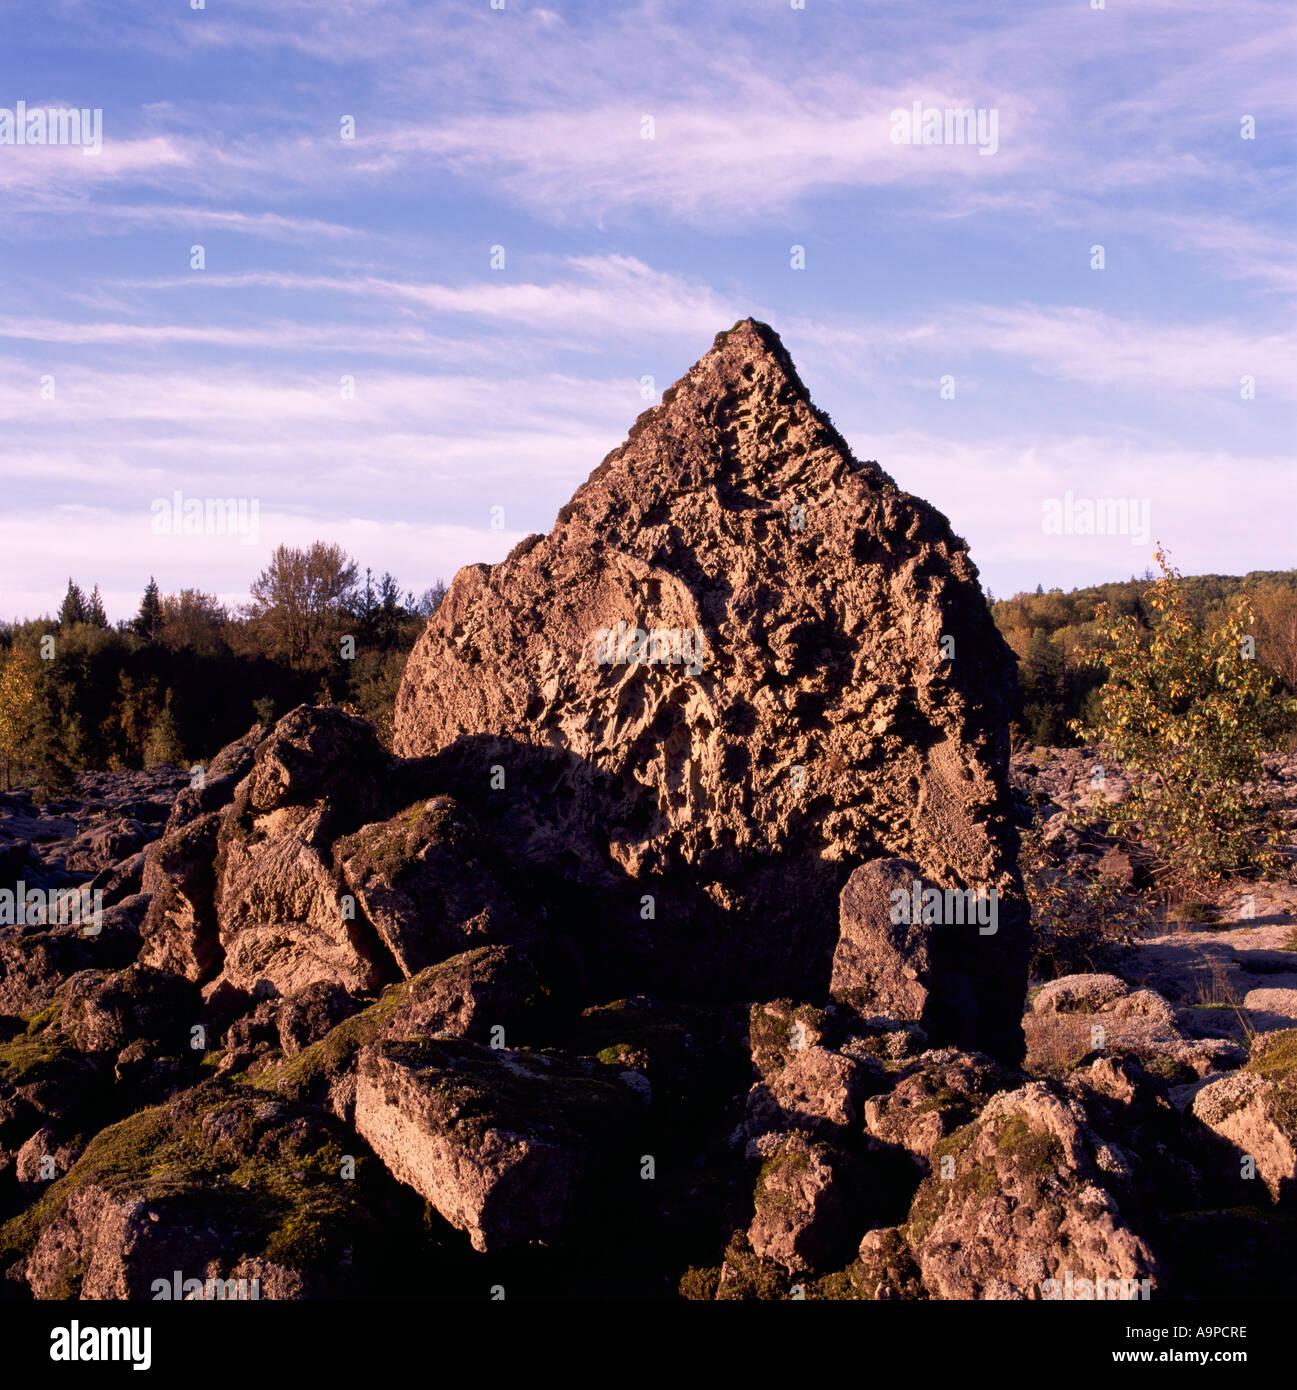 Nisga'a Memorial Lava Bed Provincial Park near New Aiyansh, Northern BC, British Columbia, Canada, Volcanic Rock Formation Field - Stock Image